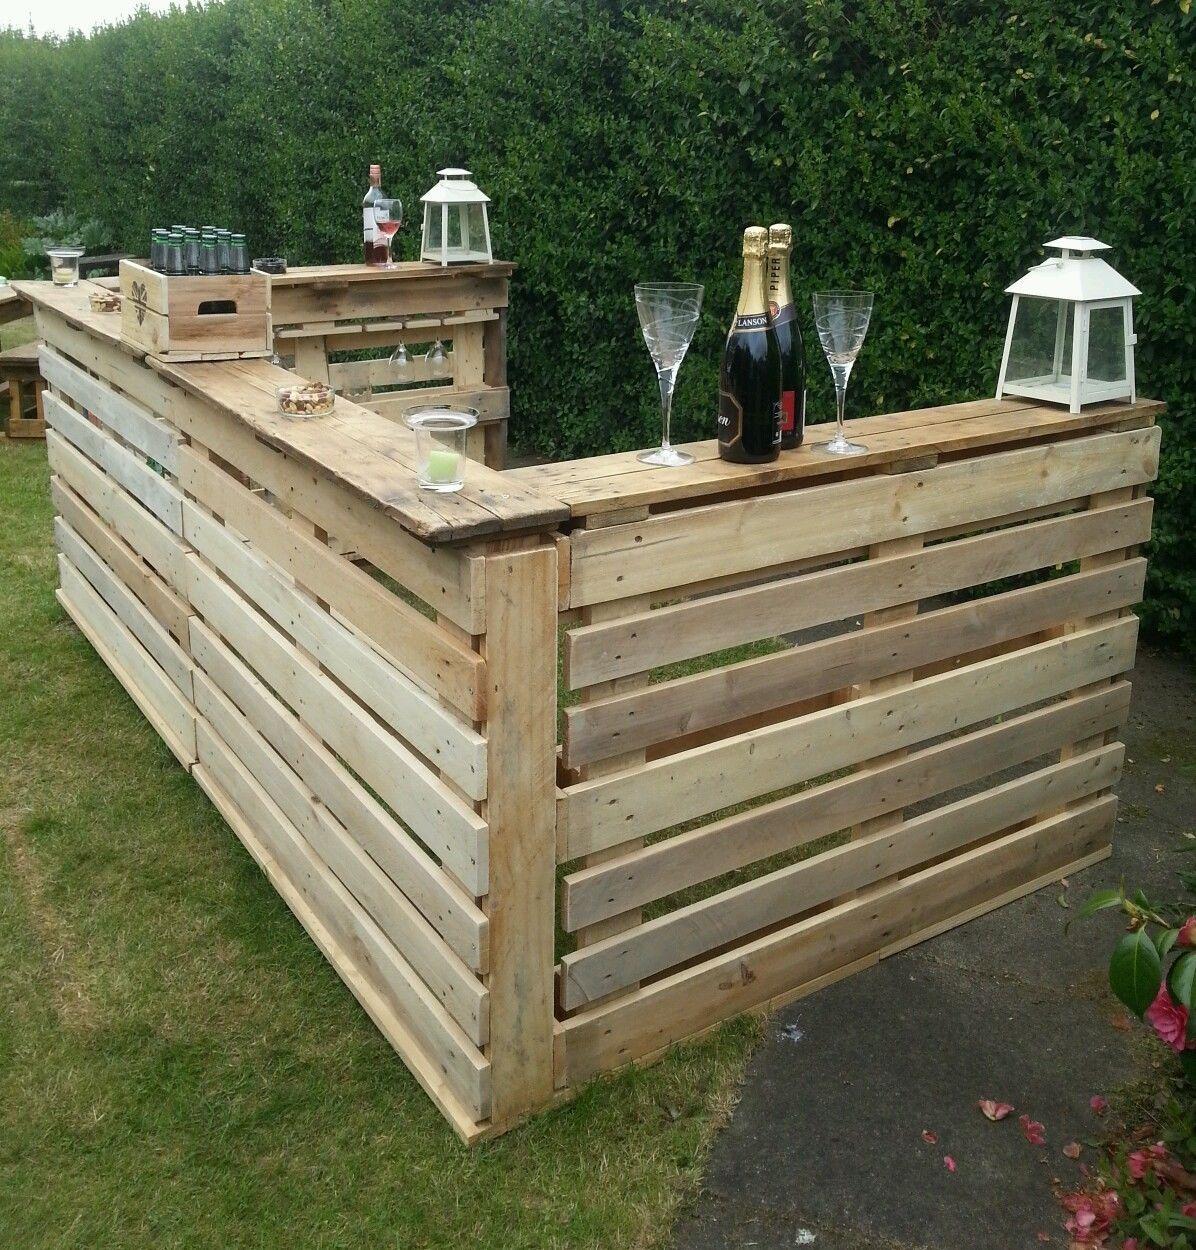 Garden Bar Pub Area With Glassholders Rustic Wood Outside Summer Drinks Bbq Ebay Diy Outdoor Bar Rustic Bar Patio Bar